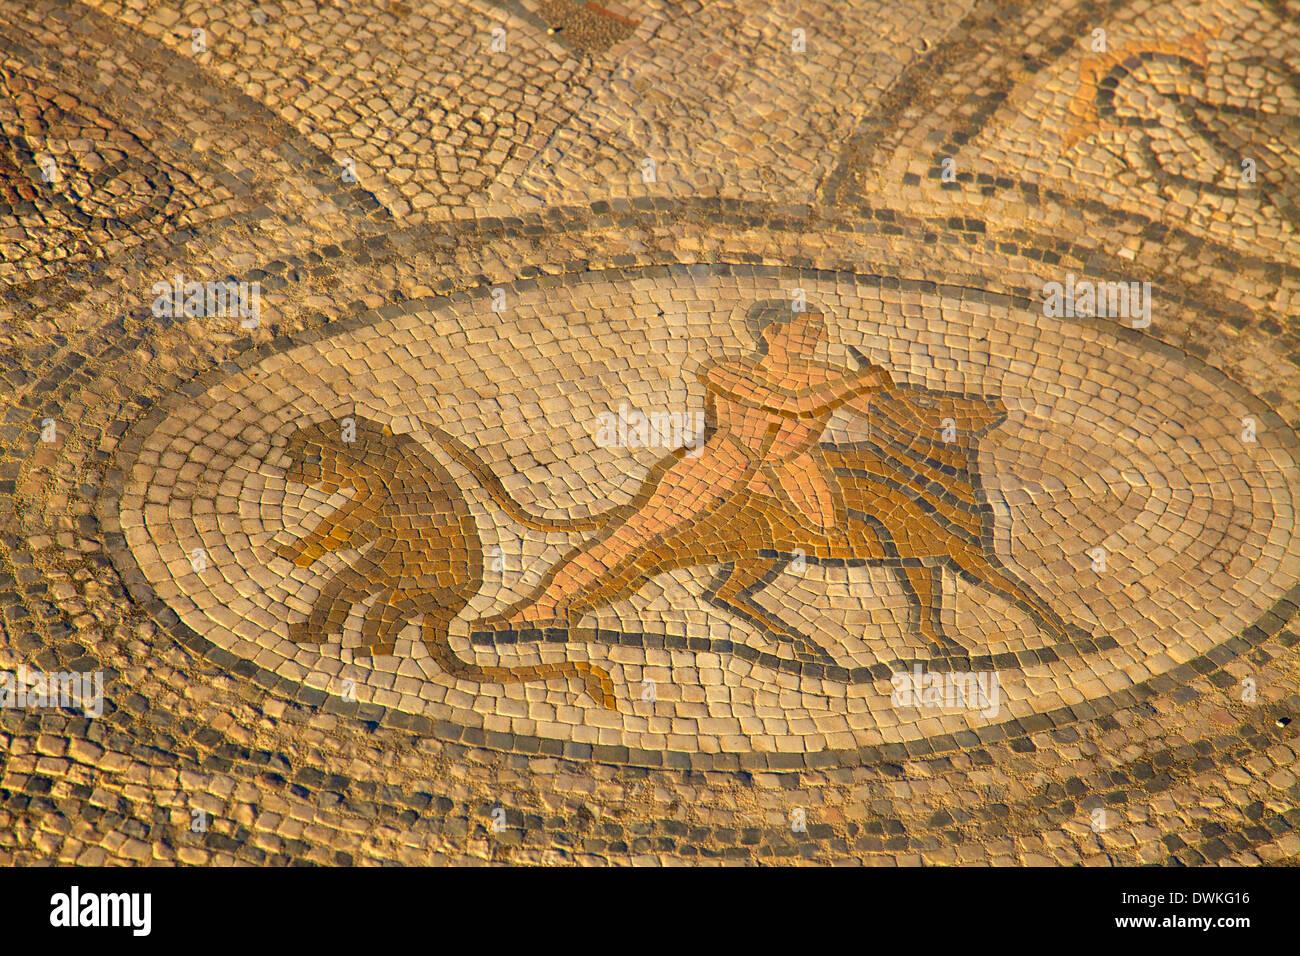 Excavated Roman City, Volubilis, UNESCO World Heritage Site, Morocco, North Africa, Africa Stock Photo